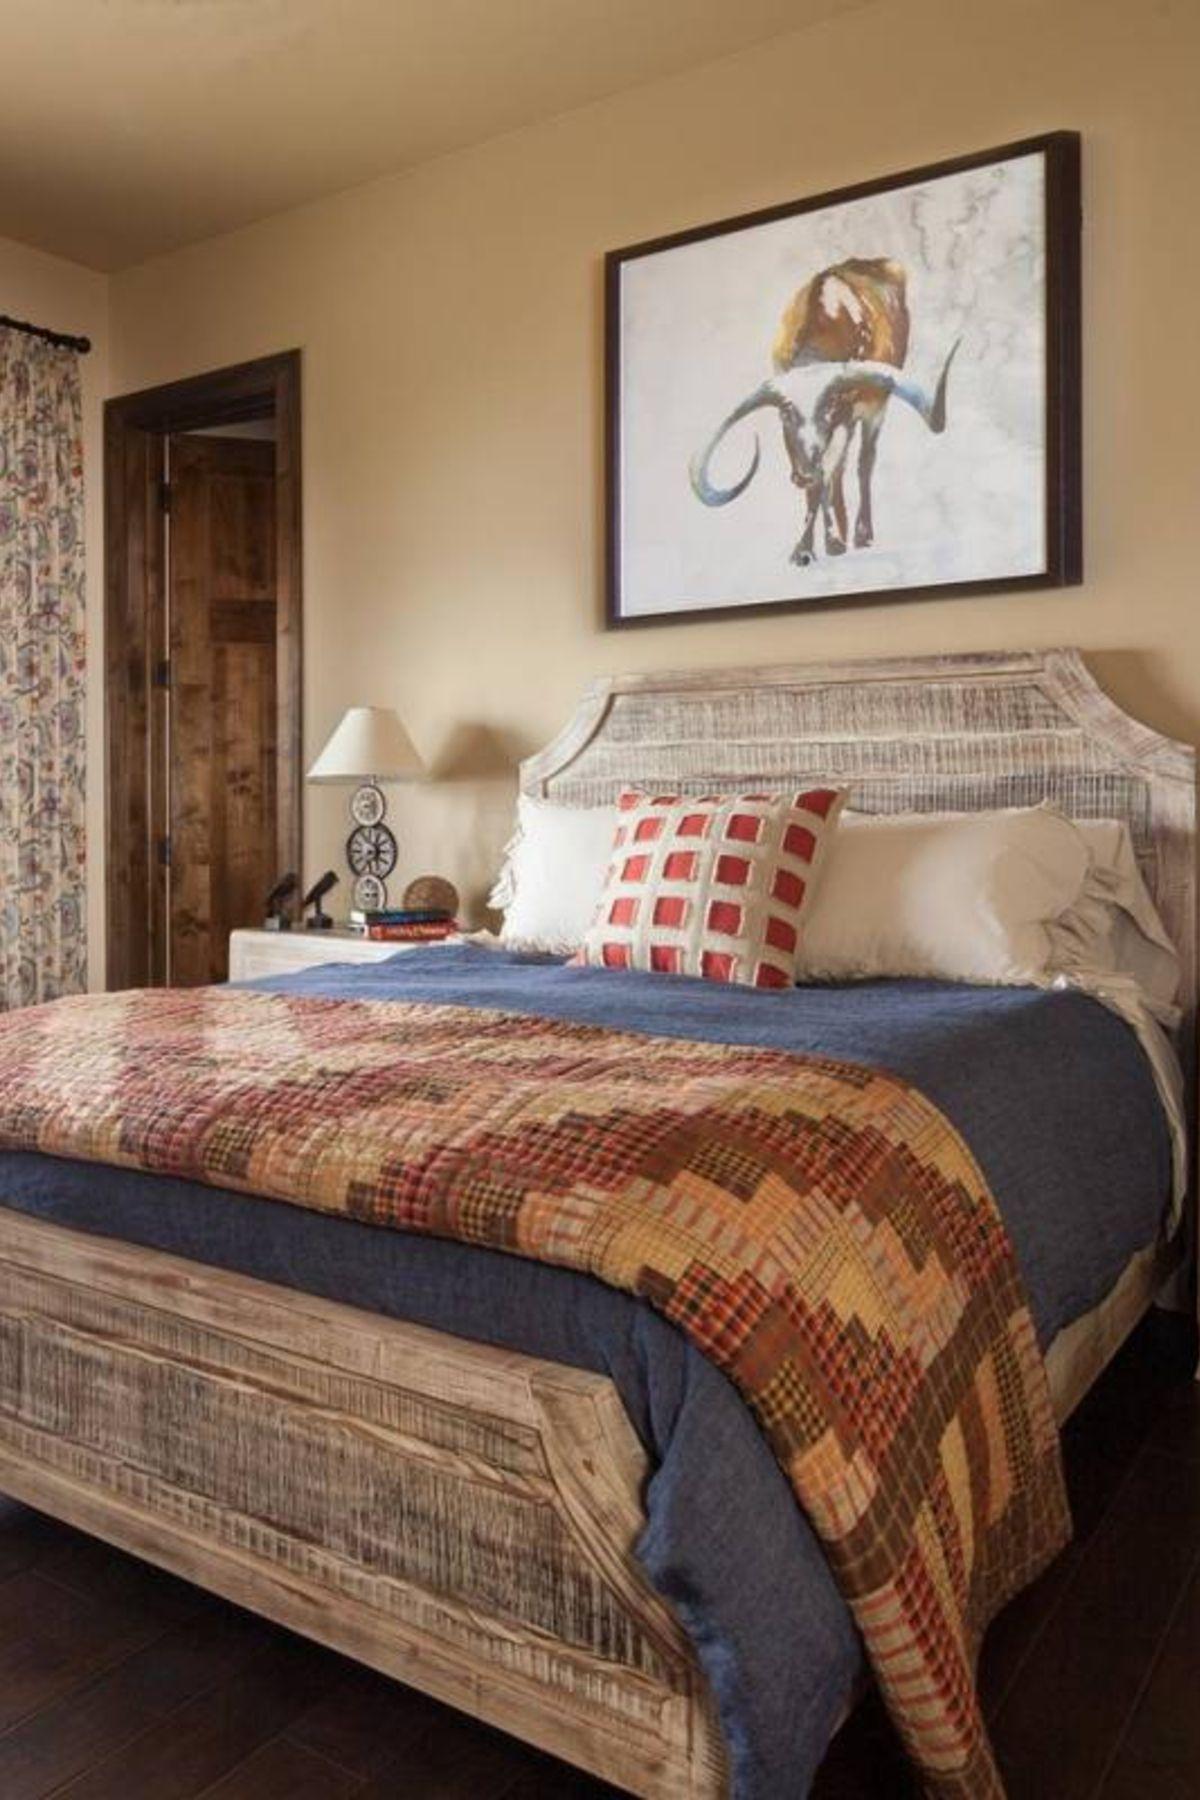 Rustic Romantic Bedroom Ideas: 39+ Guest Bedroom Decor Ideas